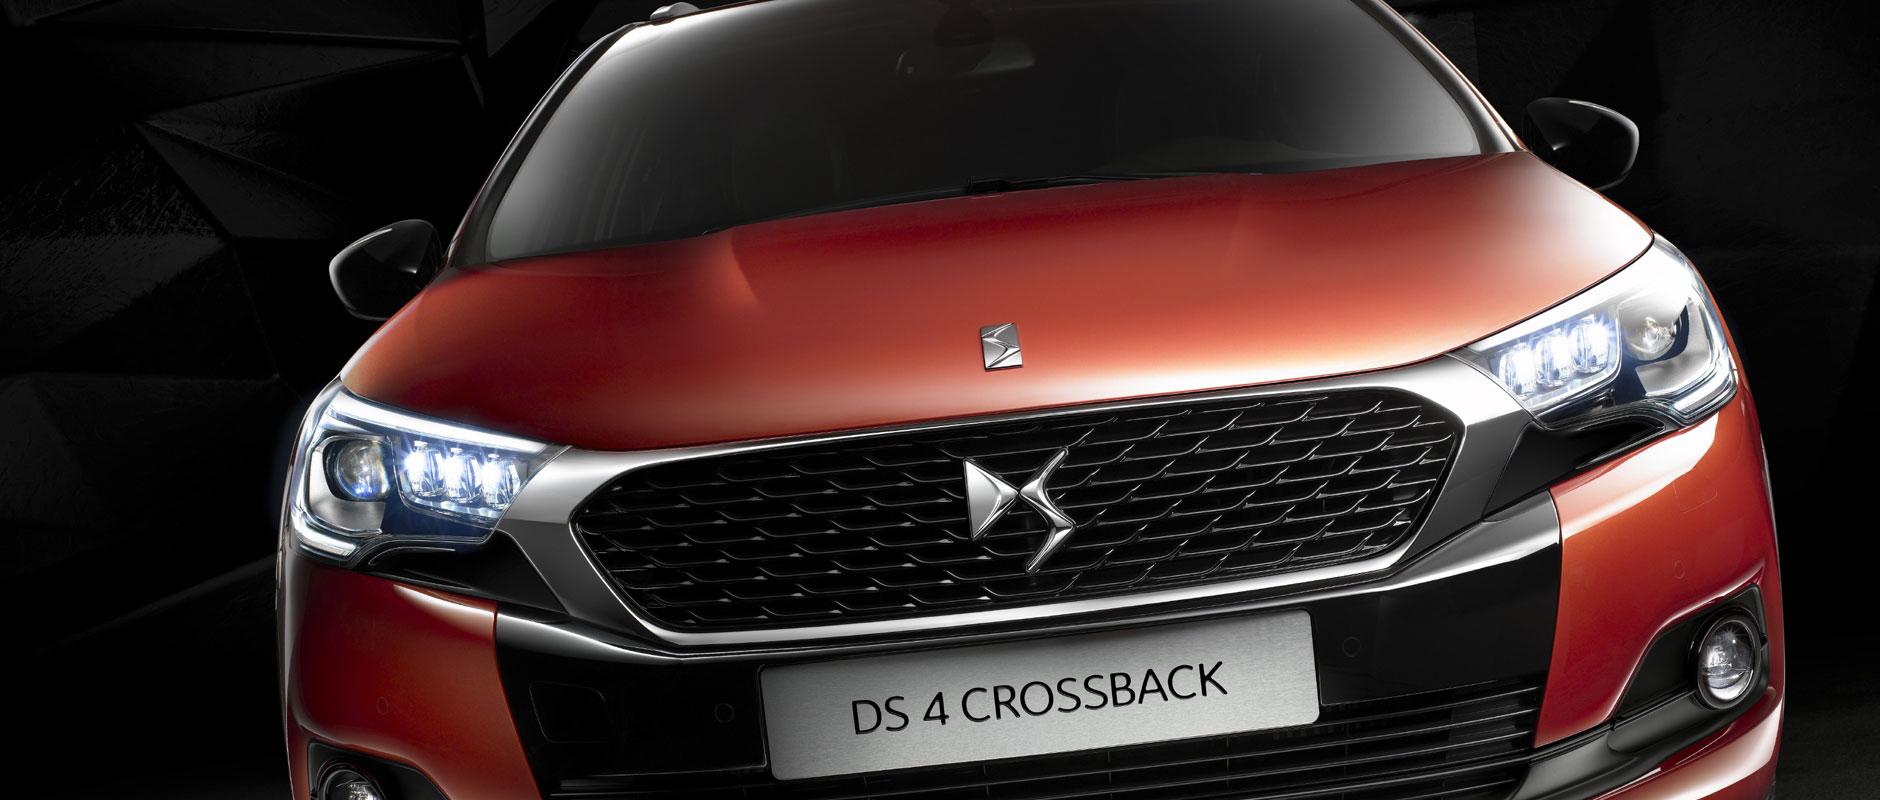 DS 4 Crossback - détails - Spoljašnjost